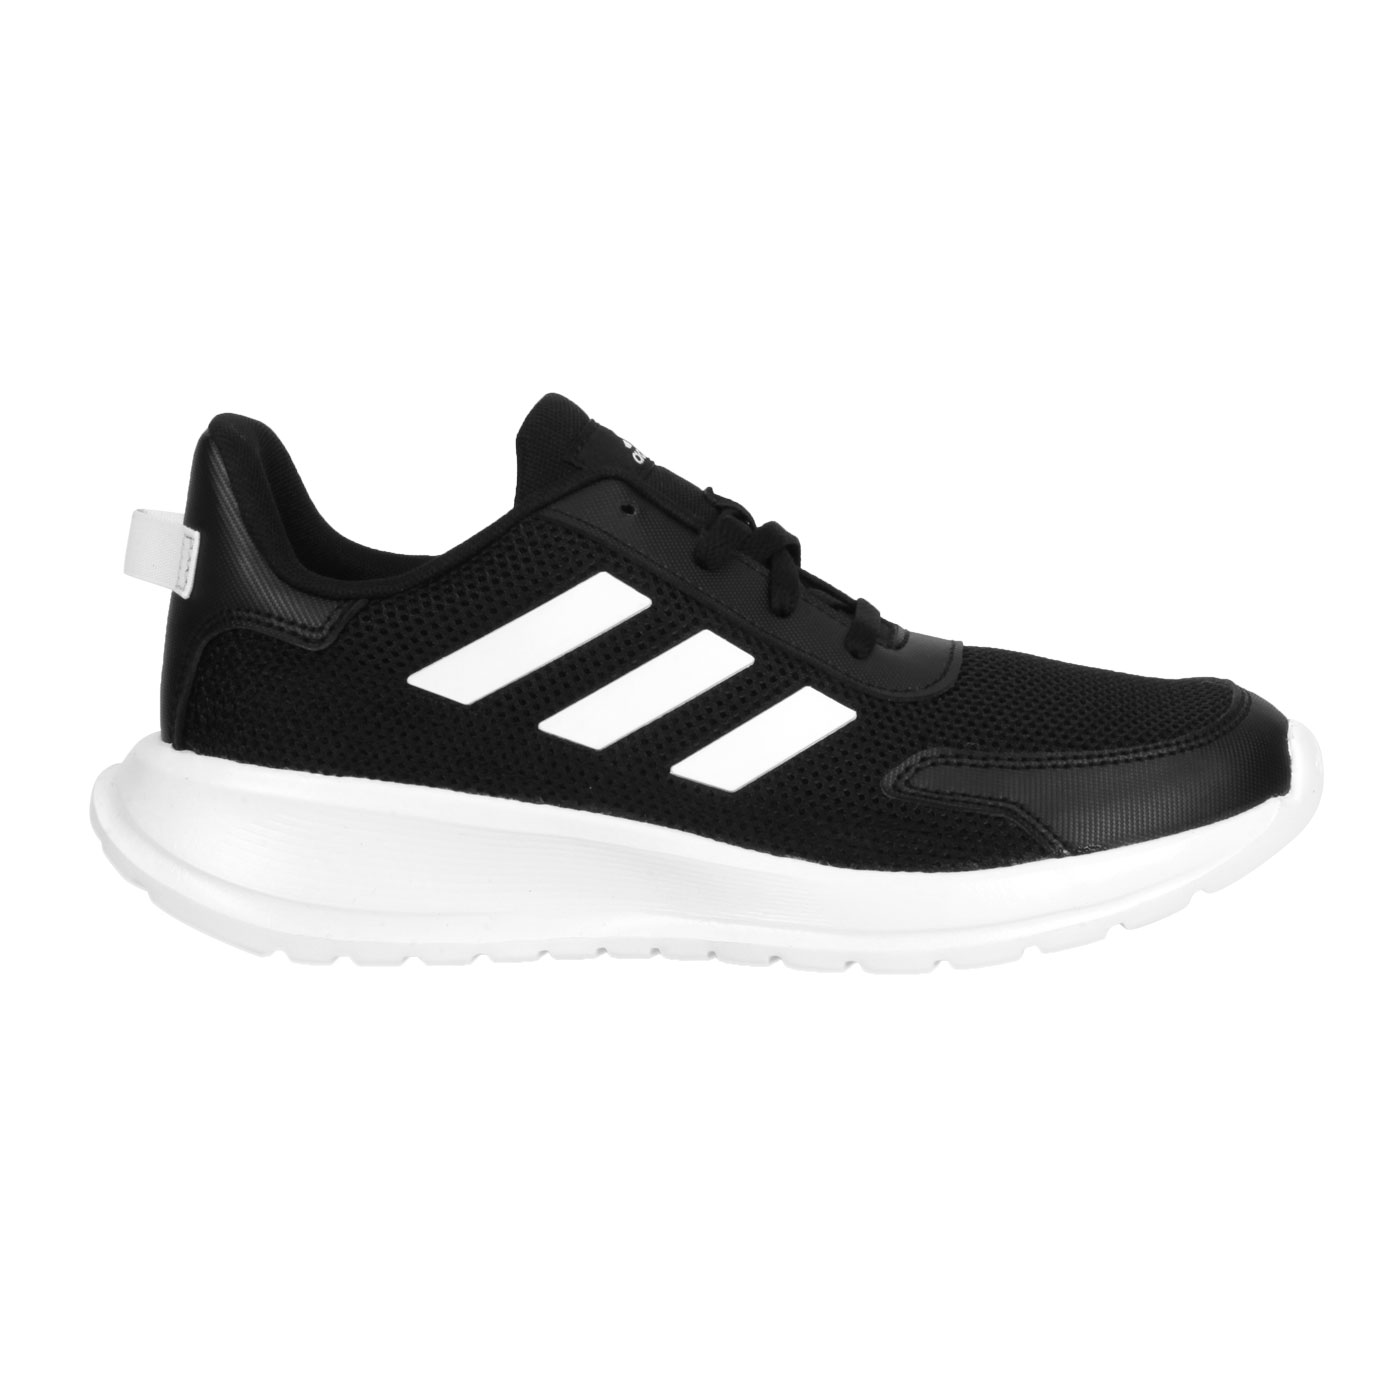 ADIDAS 大童慢跑鞋  @TENSAUR RUN K@EG4128 - 黑白